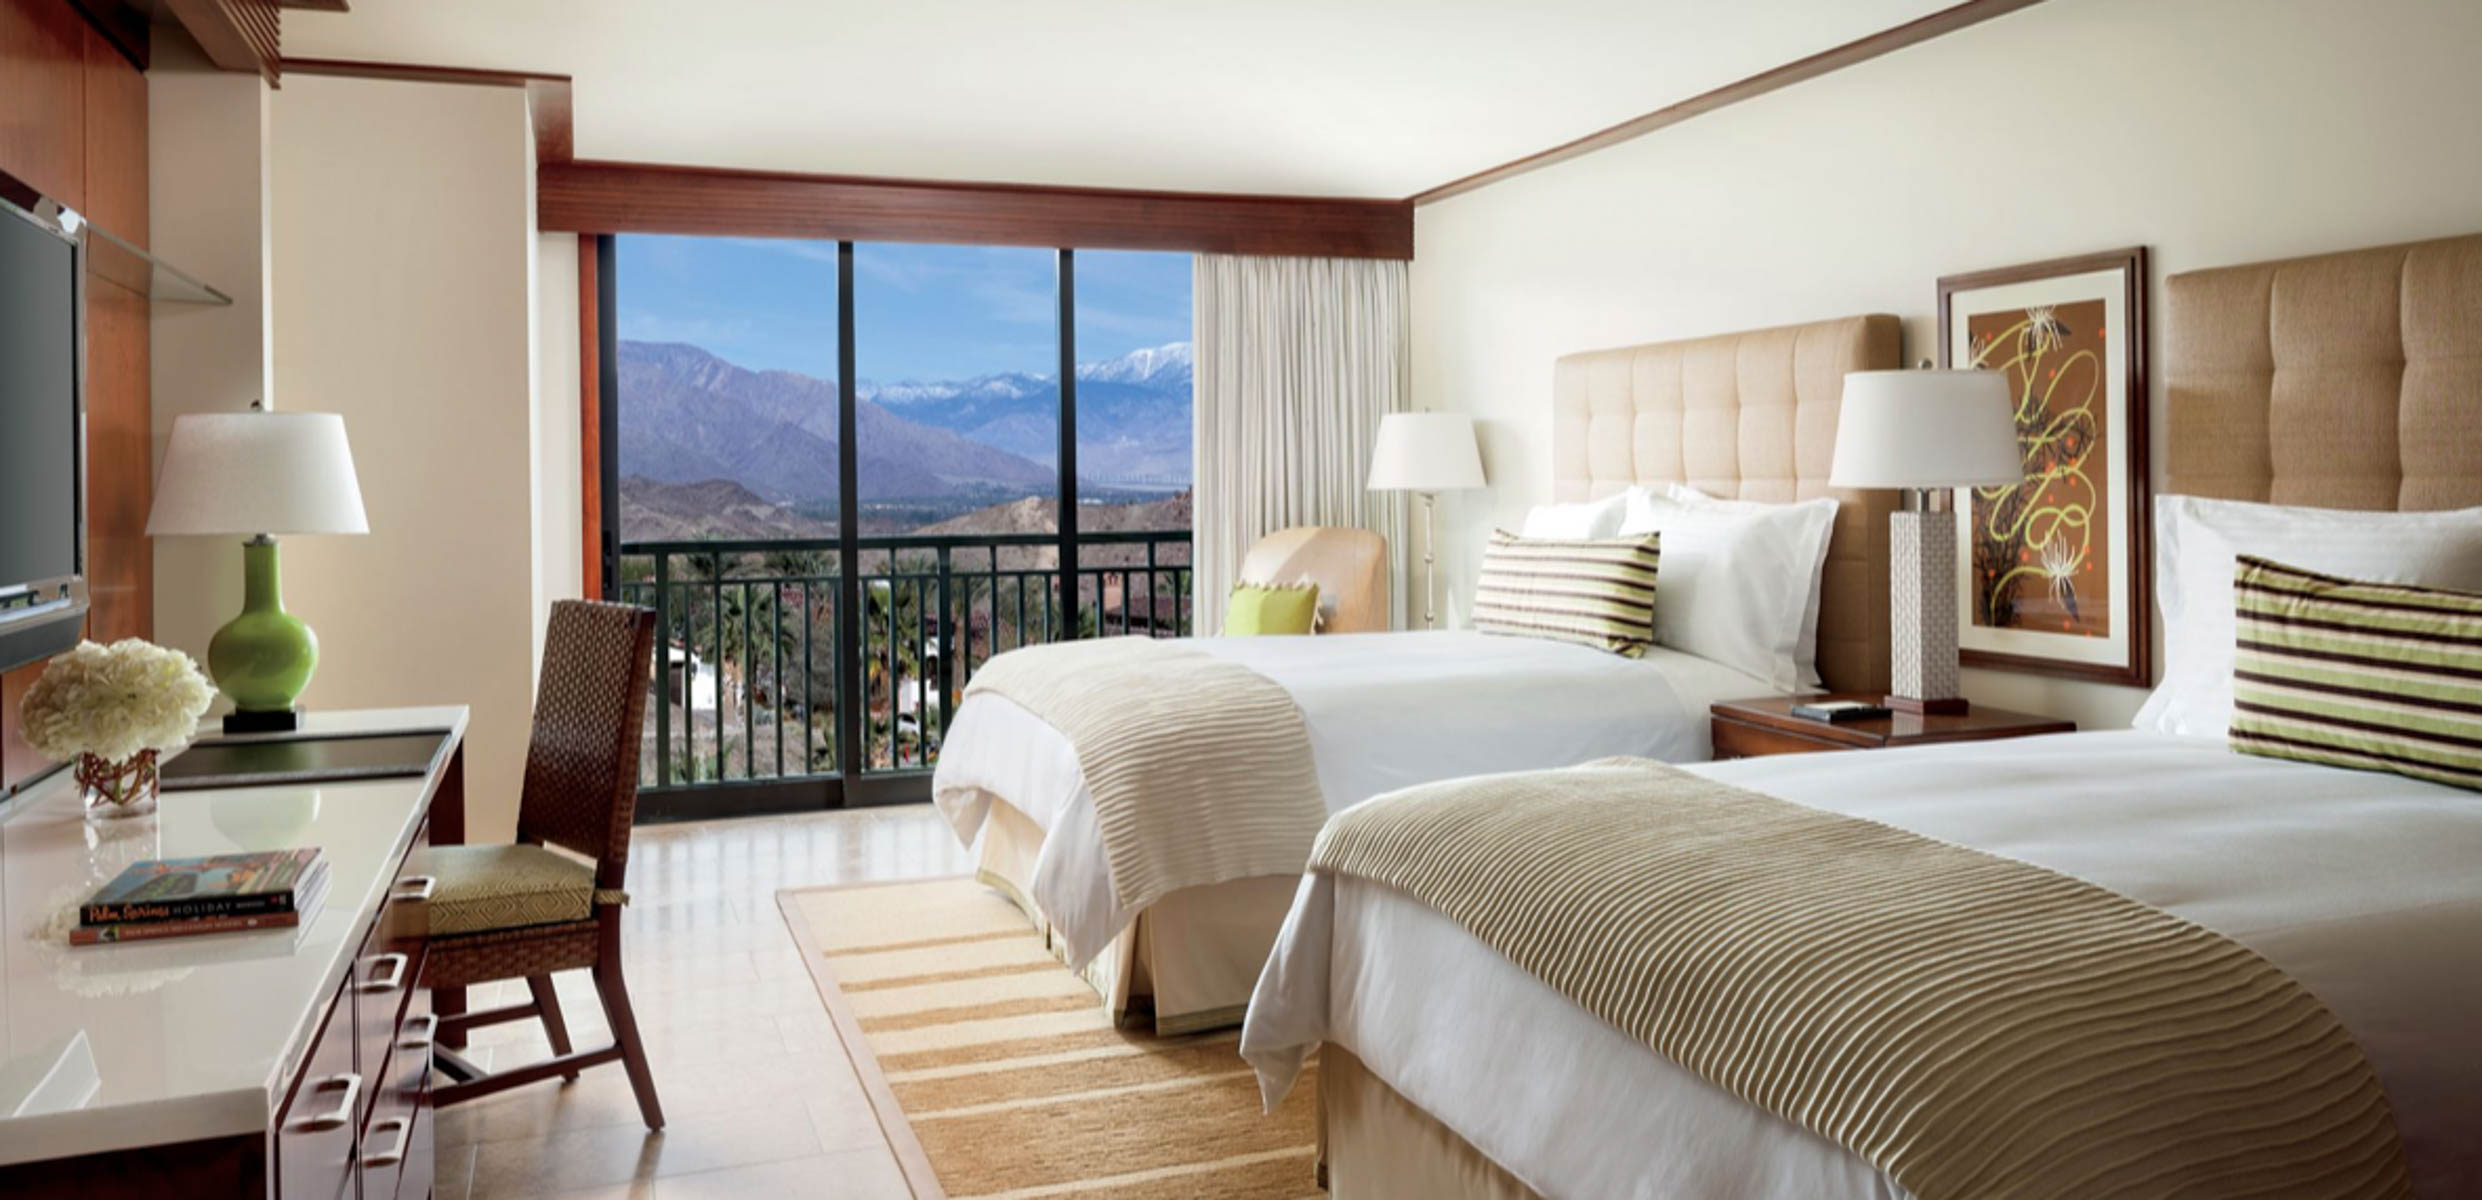 Best Palm Desert Travel Ideas_Palm Desert Hotels_Palm Desert_resorts_Addie Bell-12.jpg